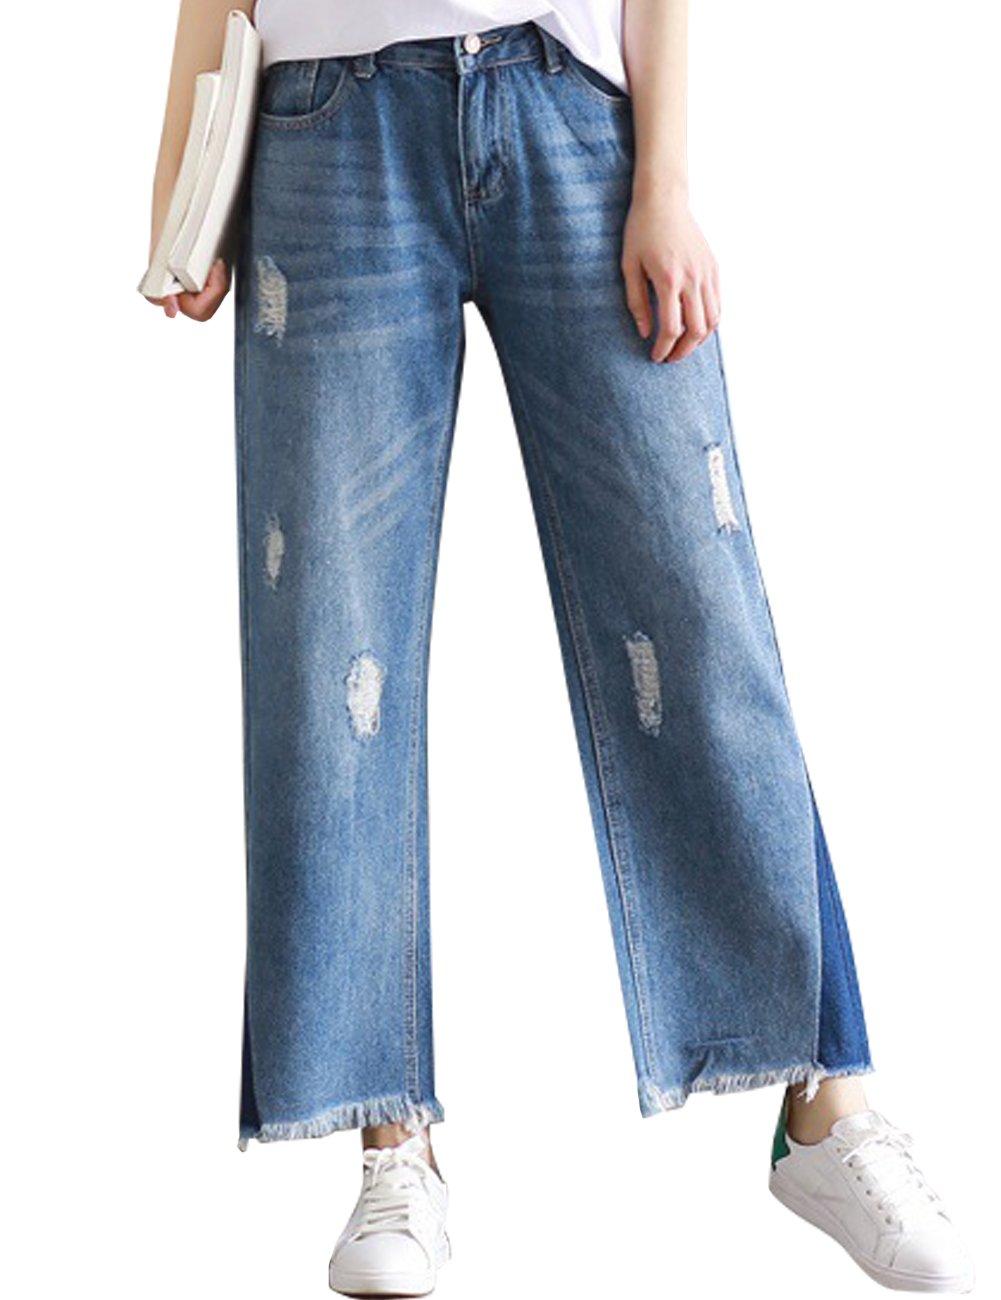 SUGIRLS Women's Casual High Waist Wide Leg Denim Cropped Jeans Pants Tassel Hem Light Blue S